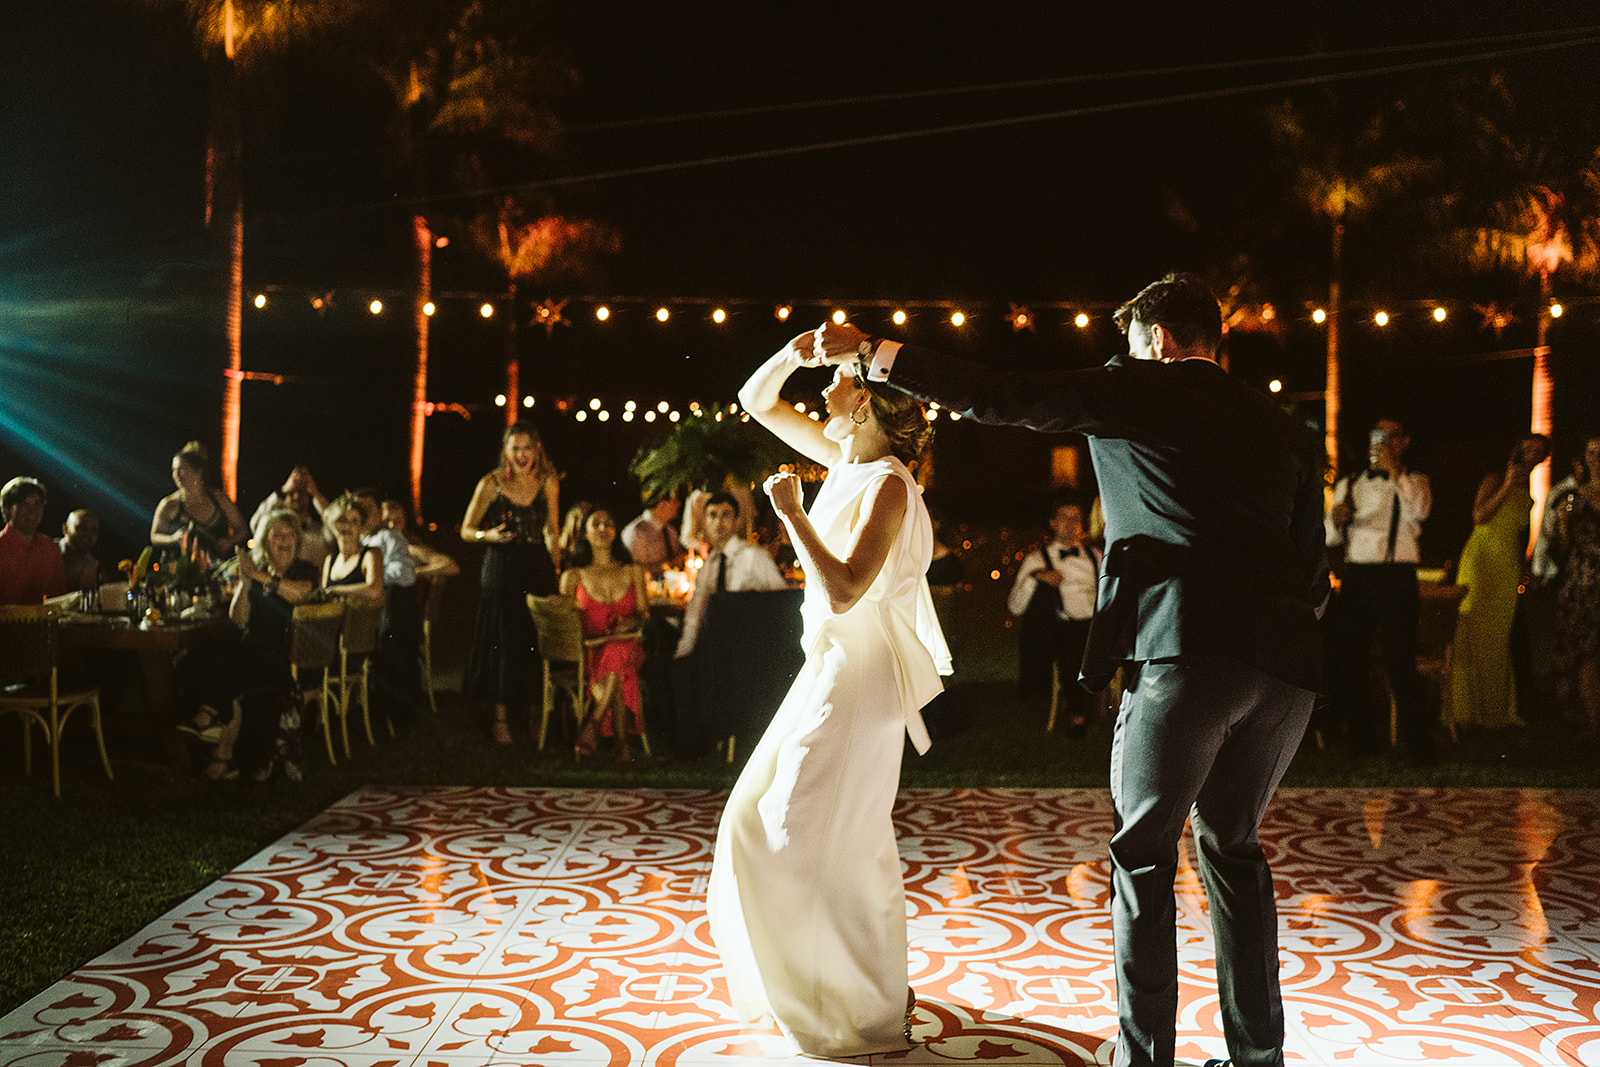 AmandaMarkus-Hacienda-Sac-Chich-Merida-Wedding-703_websize.jpg